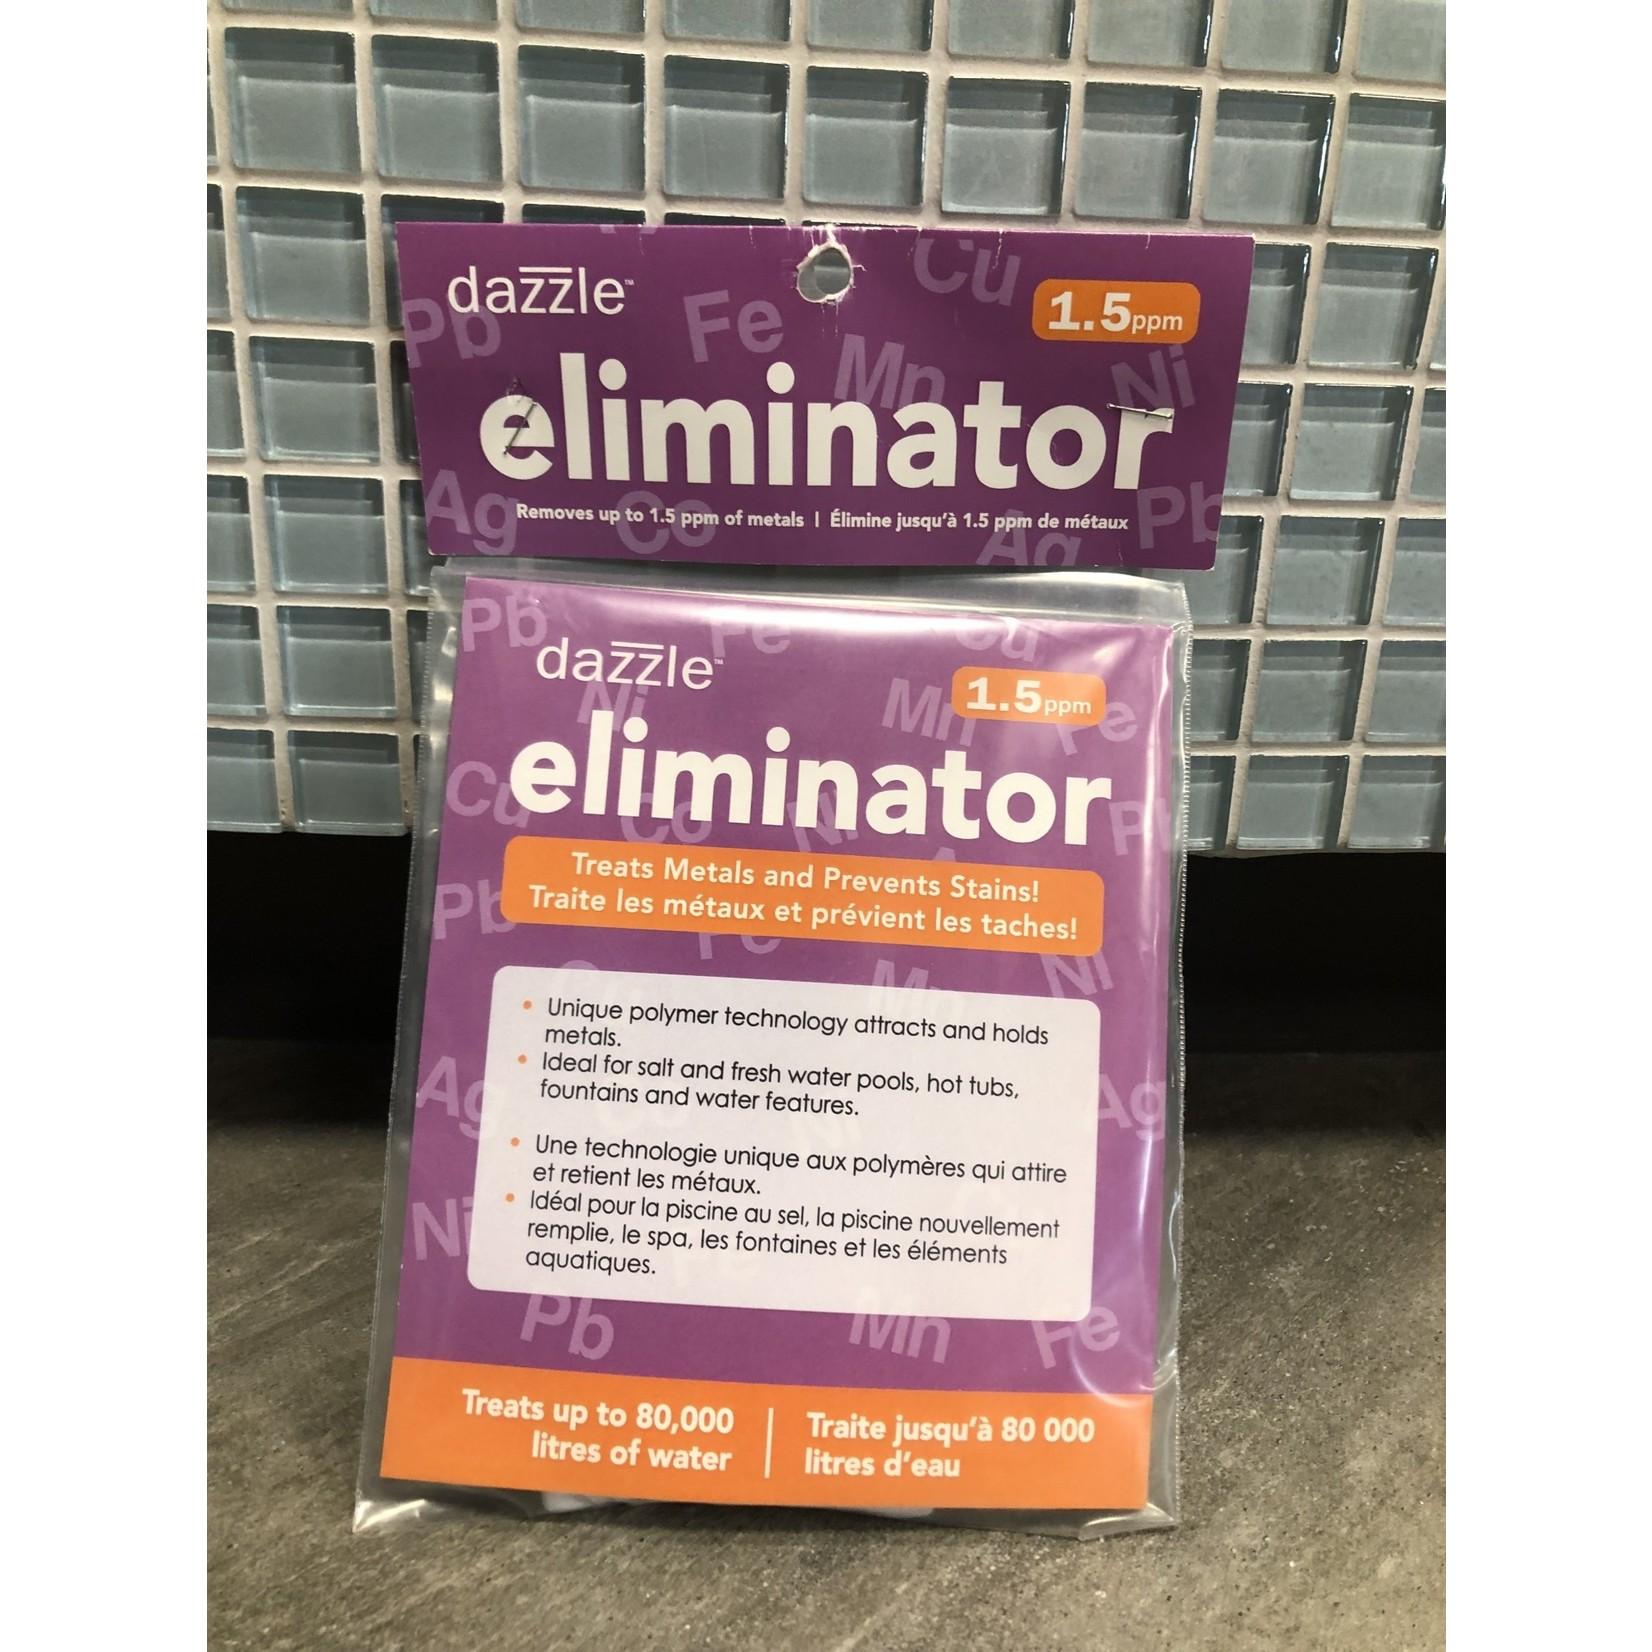 Dazzle DAZZLE ELIMINATOR 1.5PPM